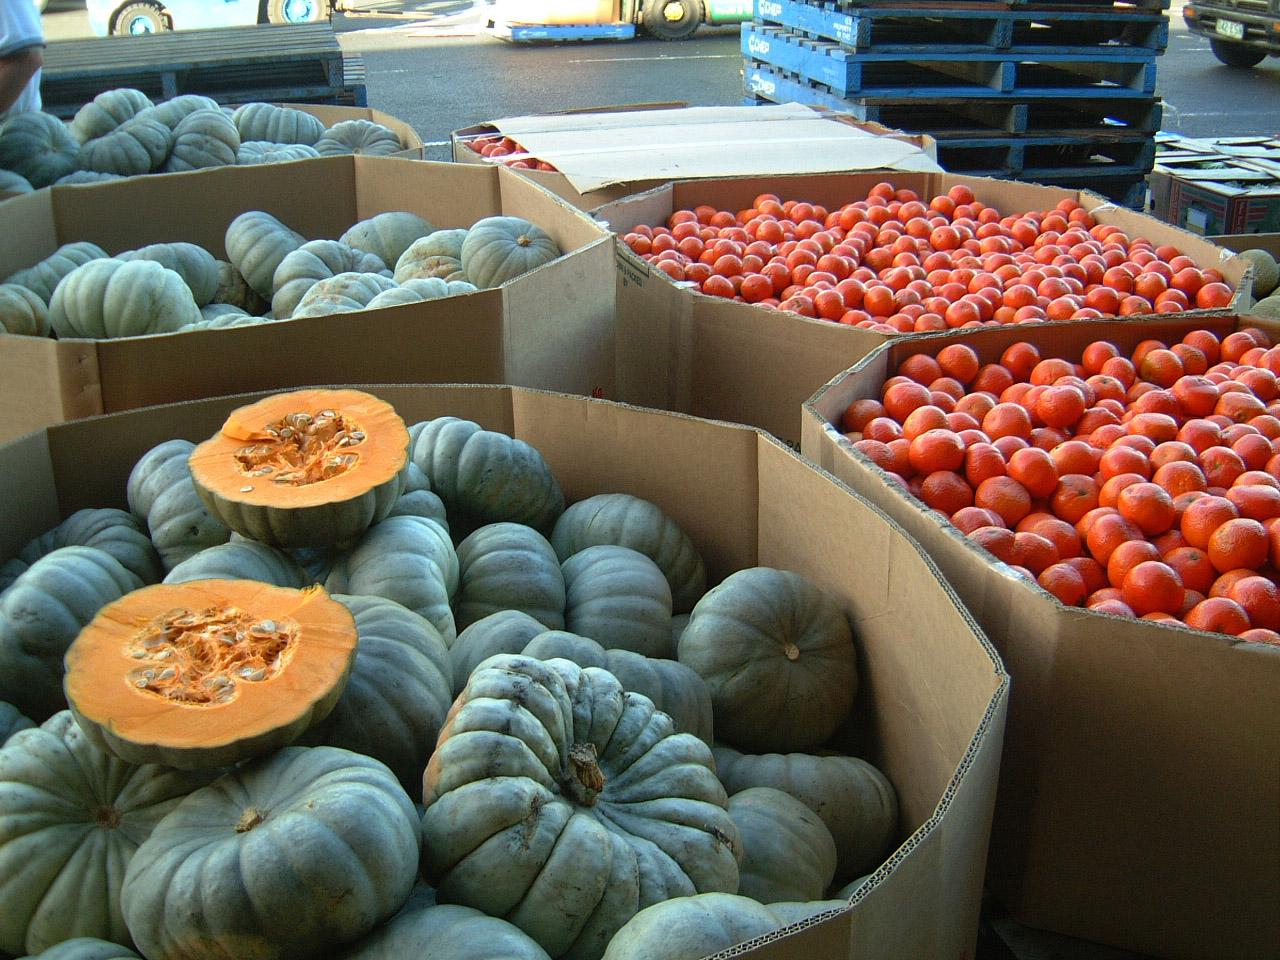 Brisbane Markets Sherwood Road Rocklea Queensland 4106 pumpkin I01